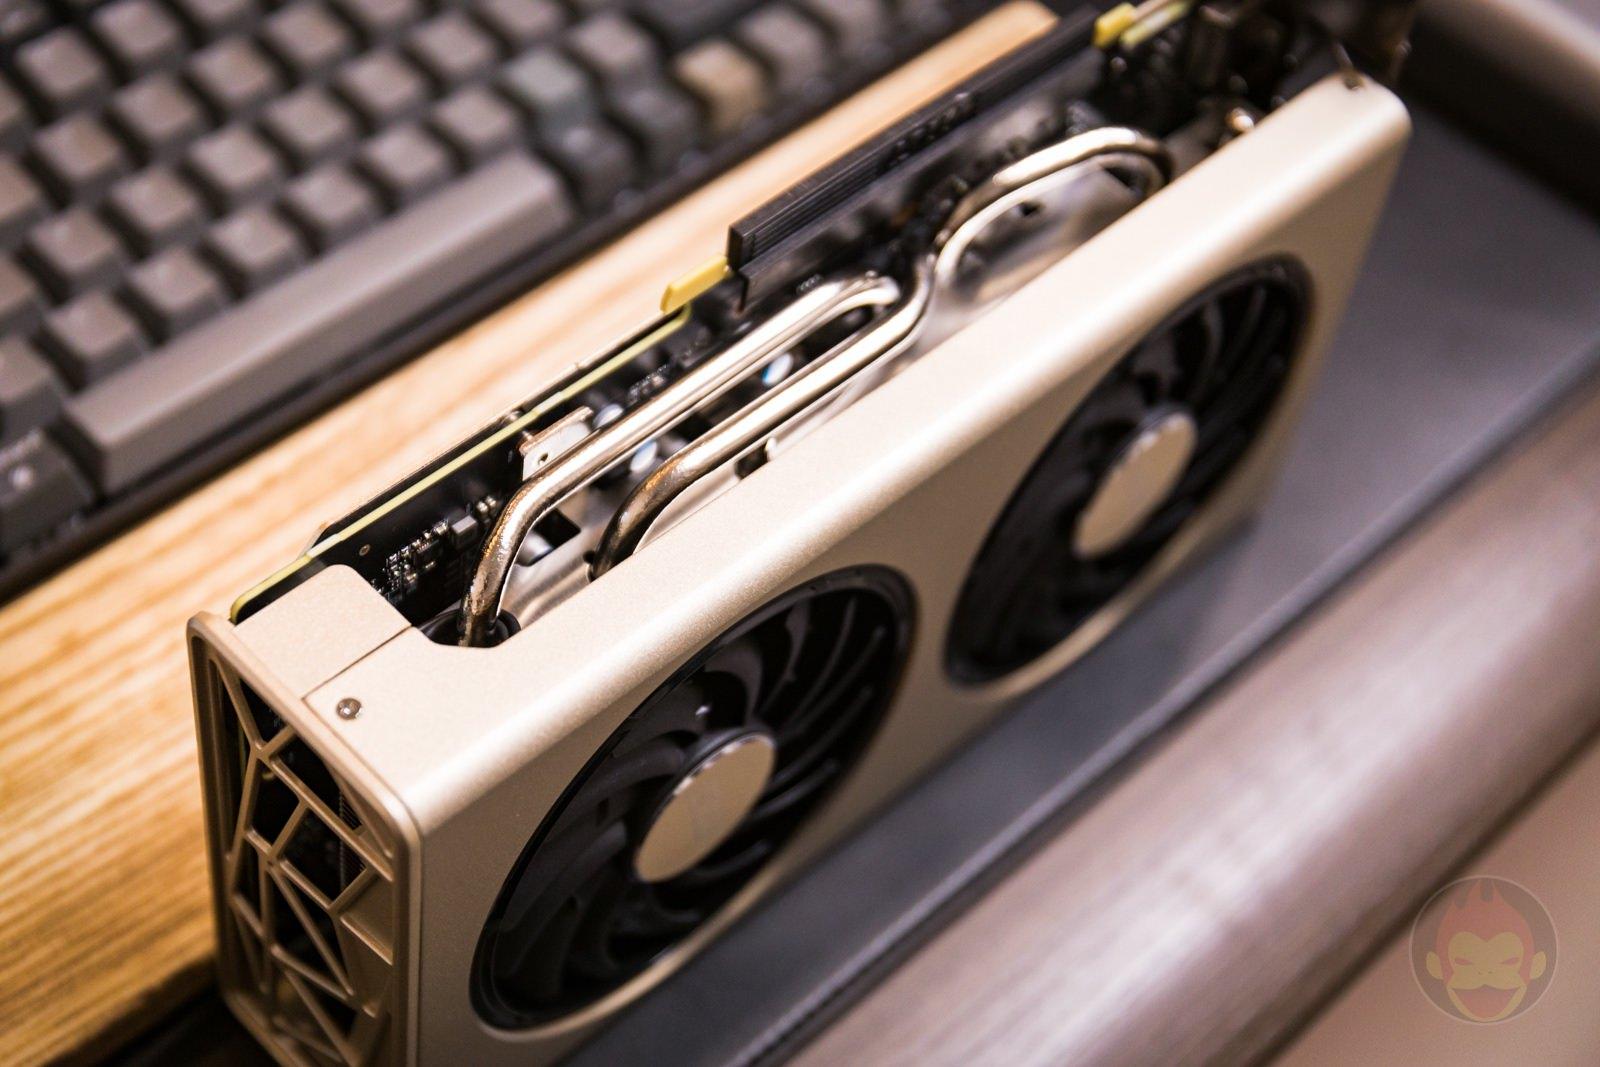 AKiTiO Node Titan with msi AMD Radeon RX 5700 XT Review 13